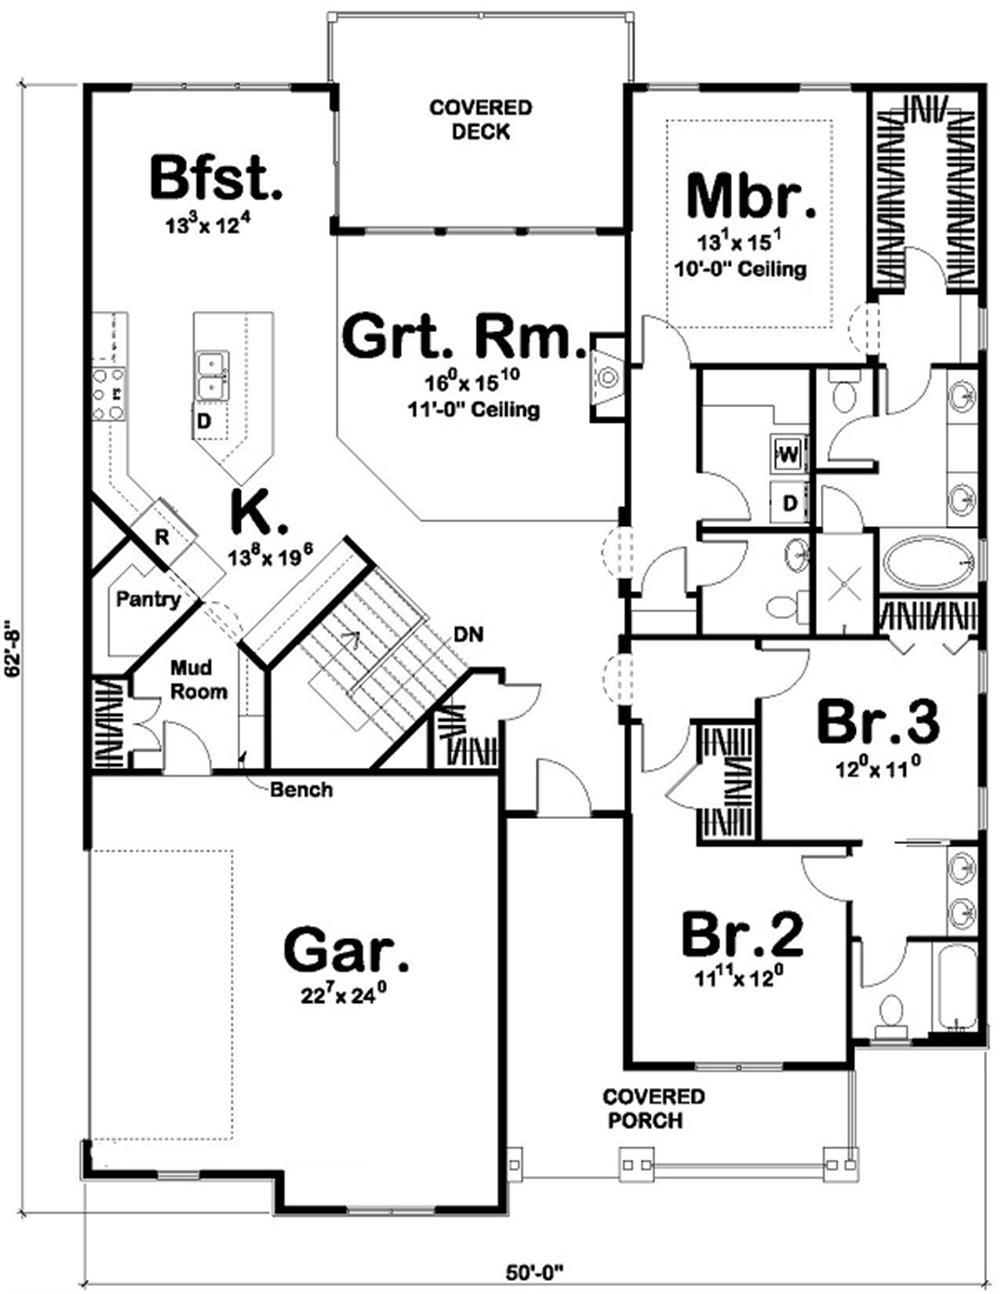 100-1195 main level